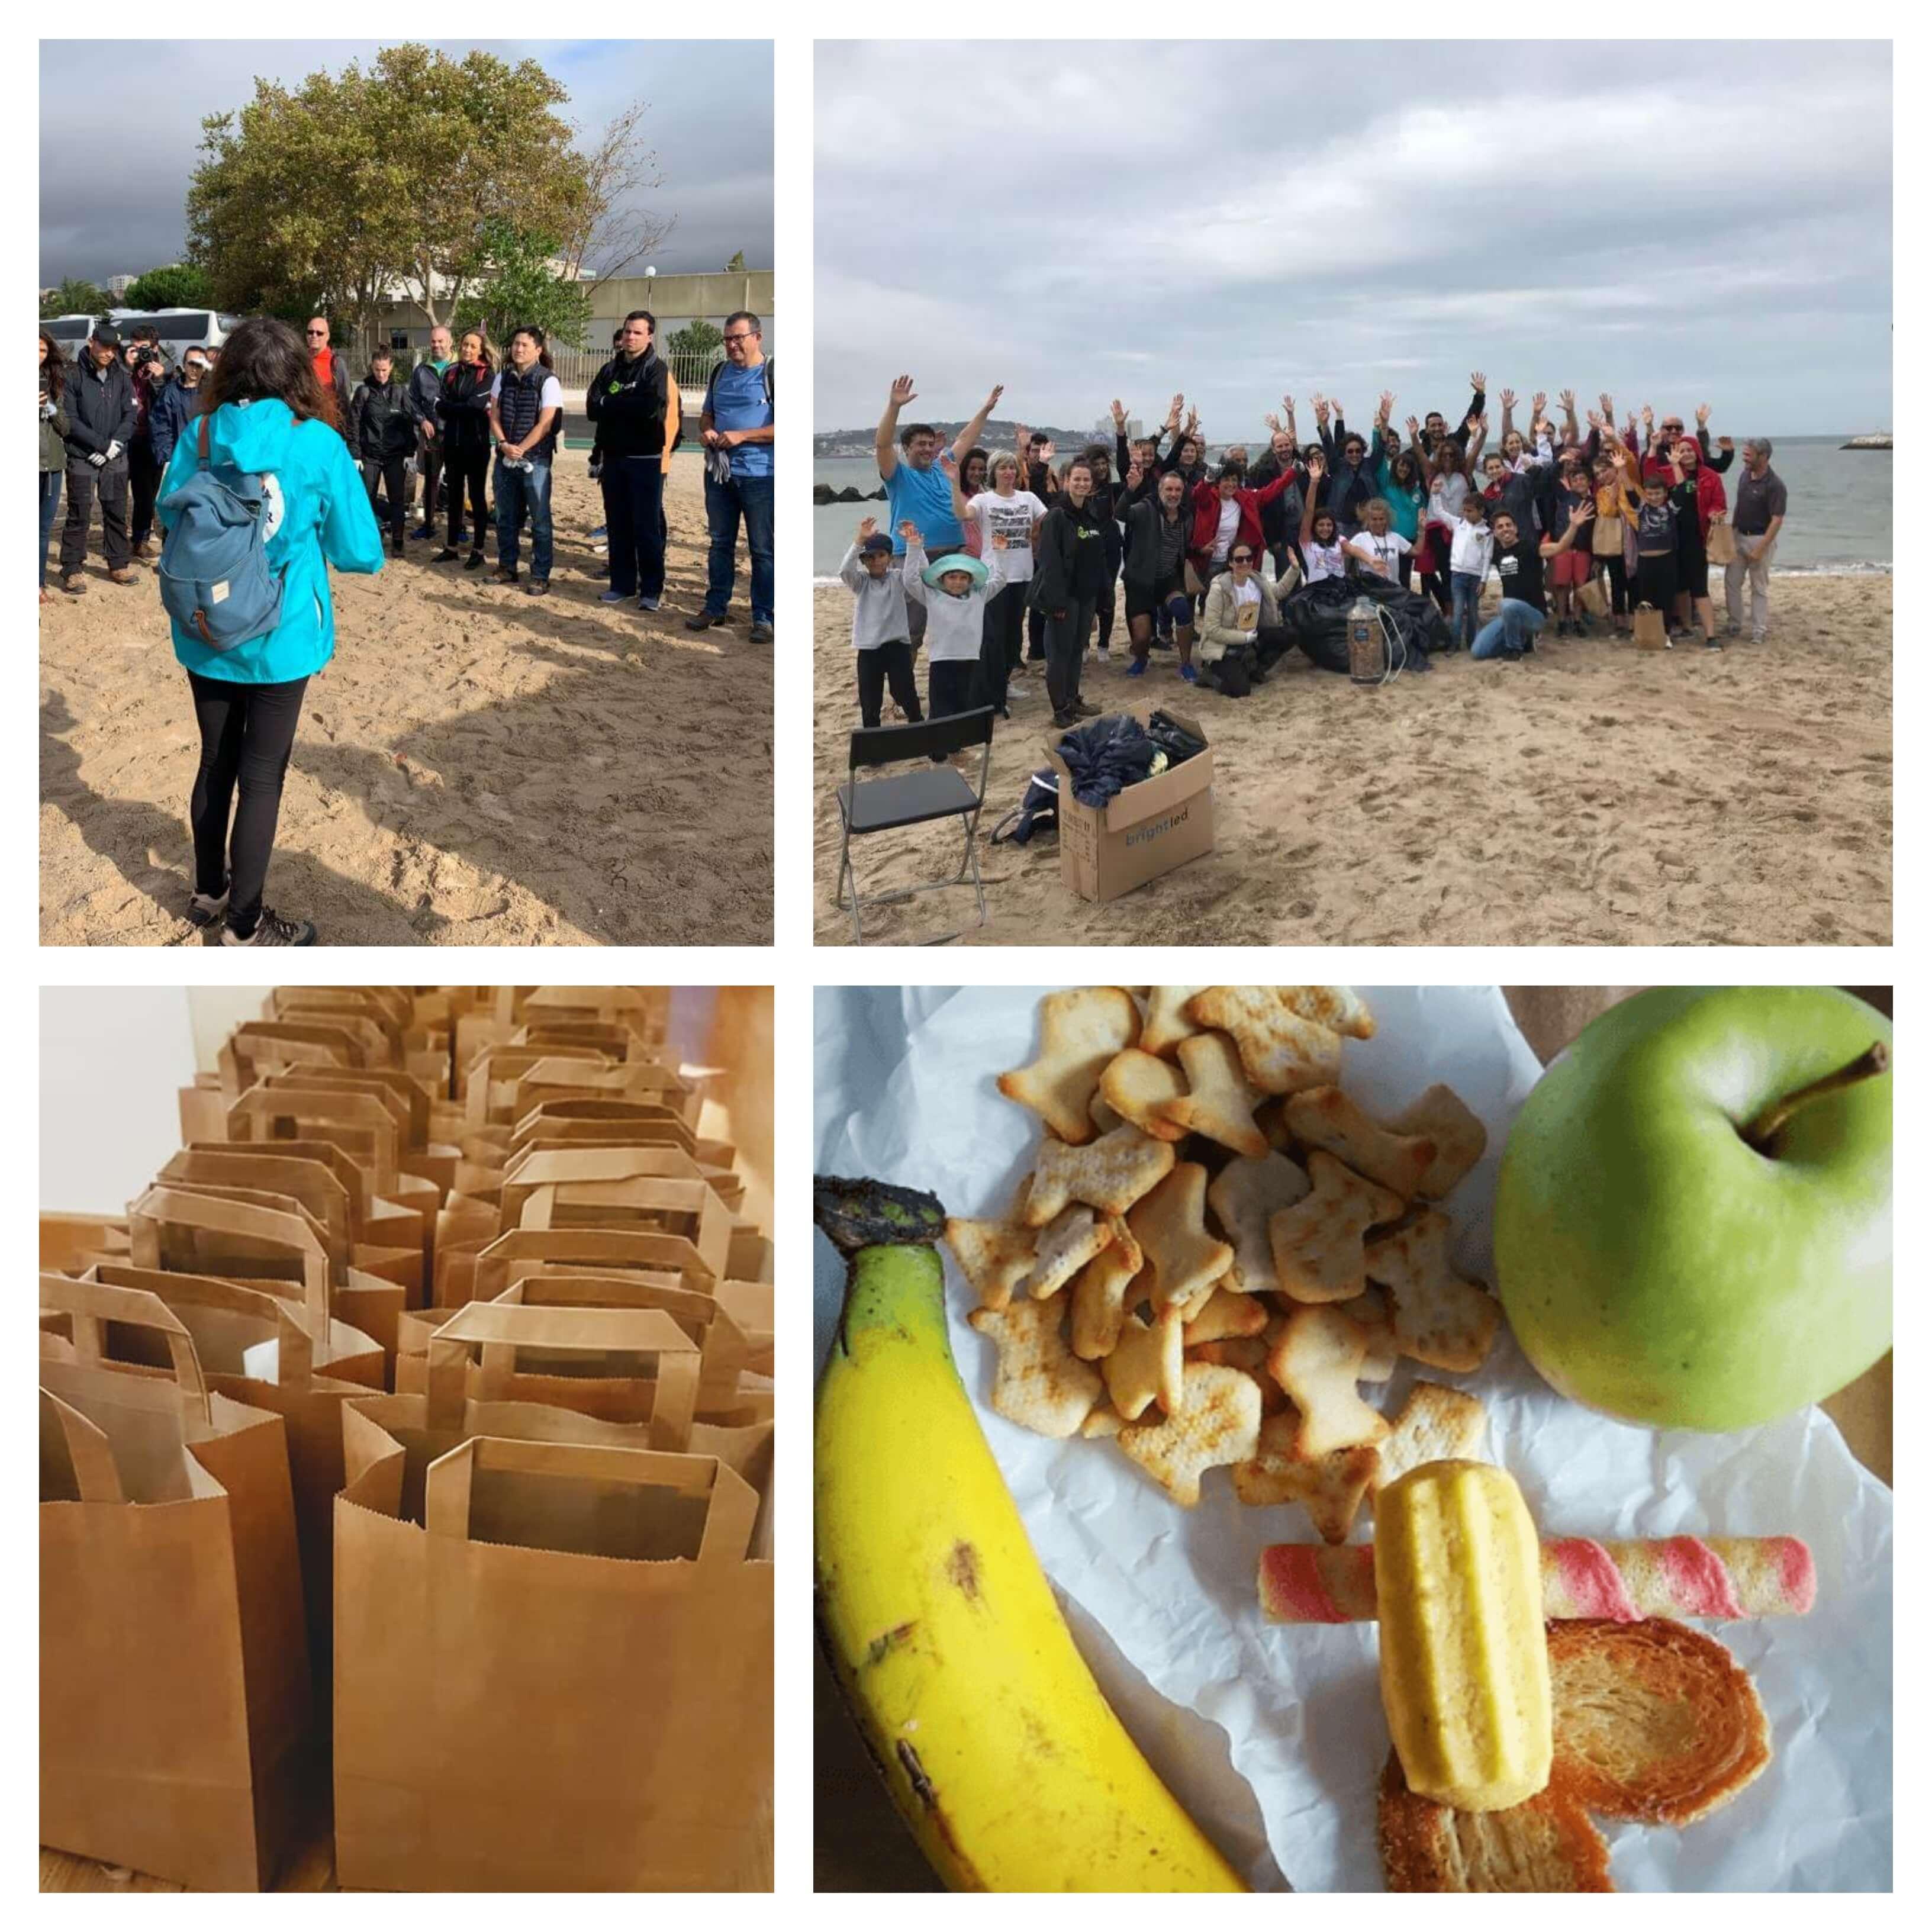 Responsabilidade Ambiental | 21 de setembro 2019 - Dia de Limpeza de Praia | IT People Innovation